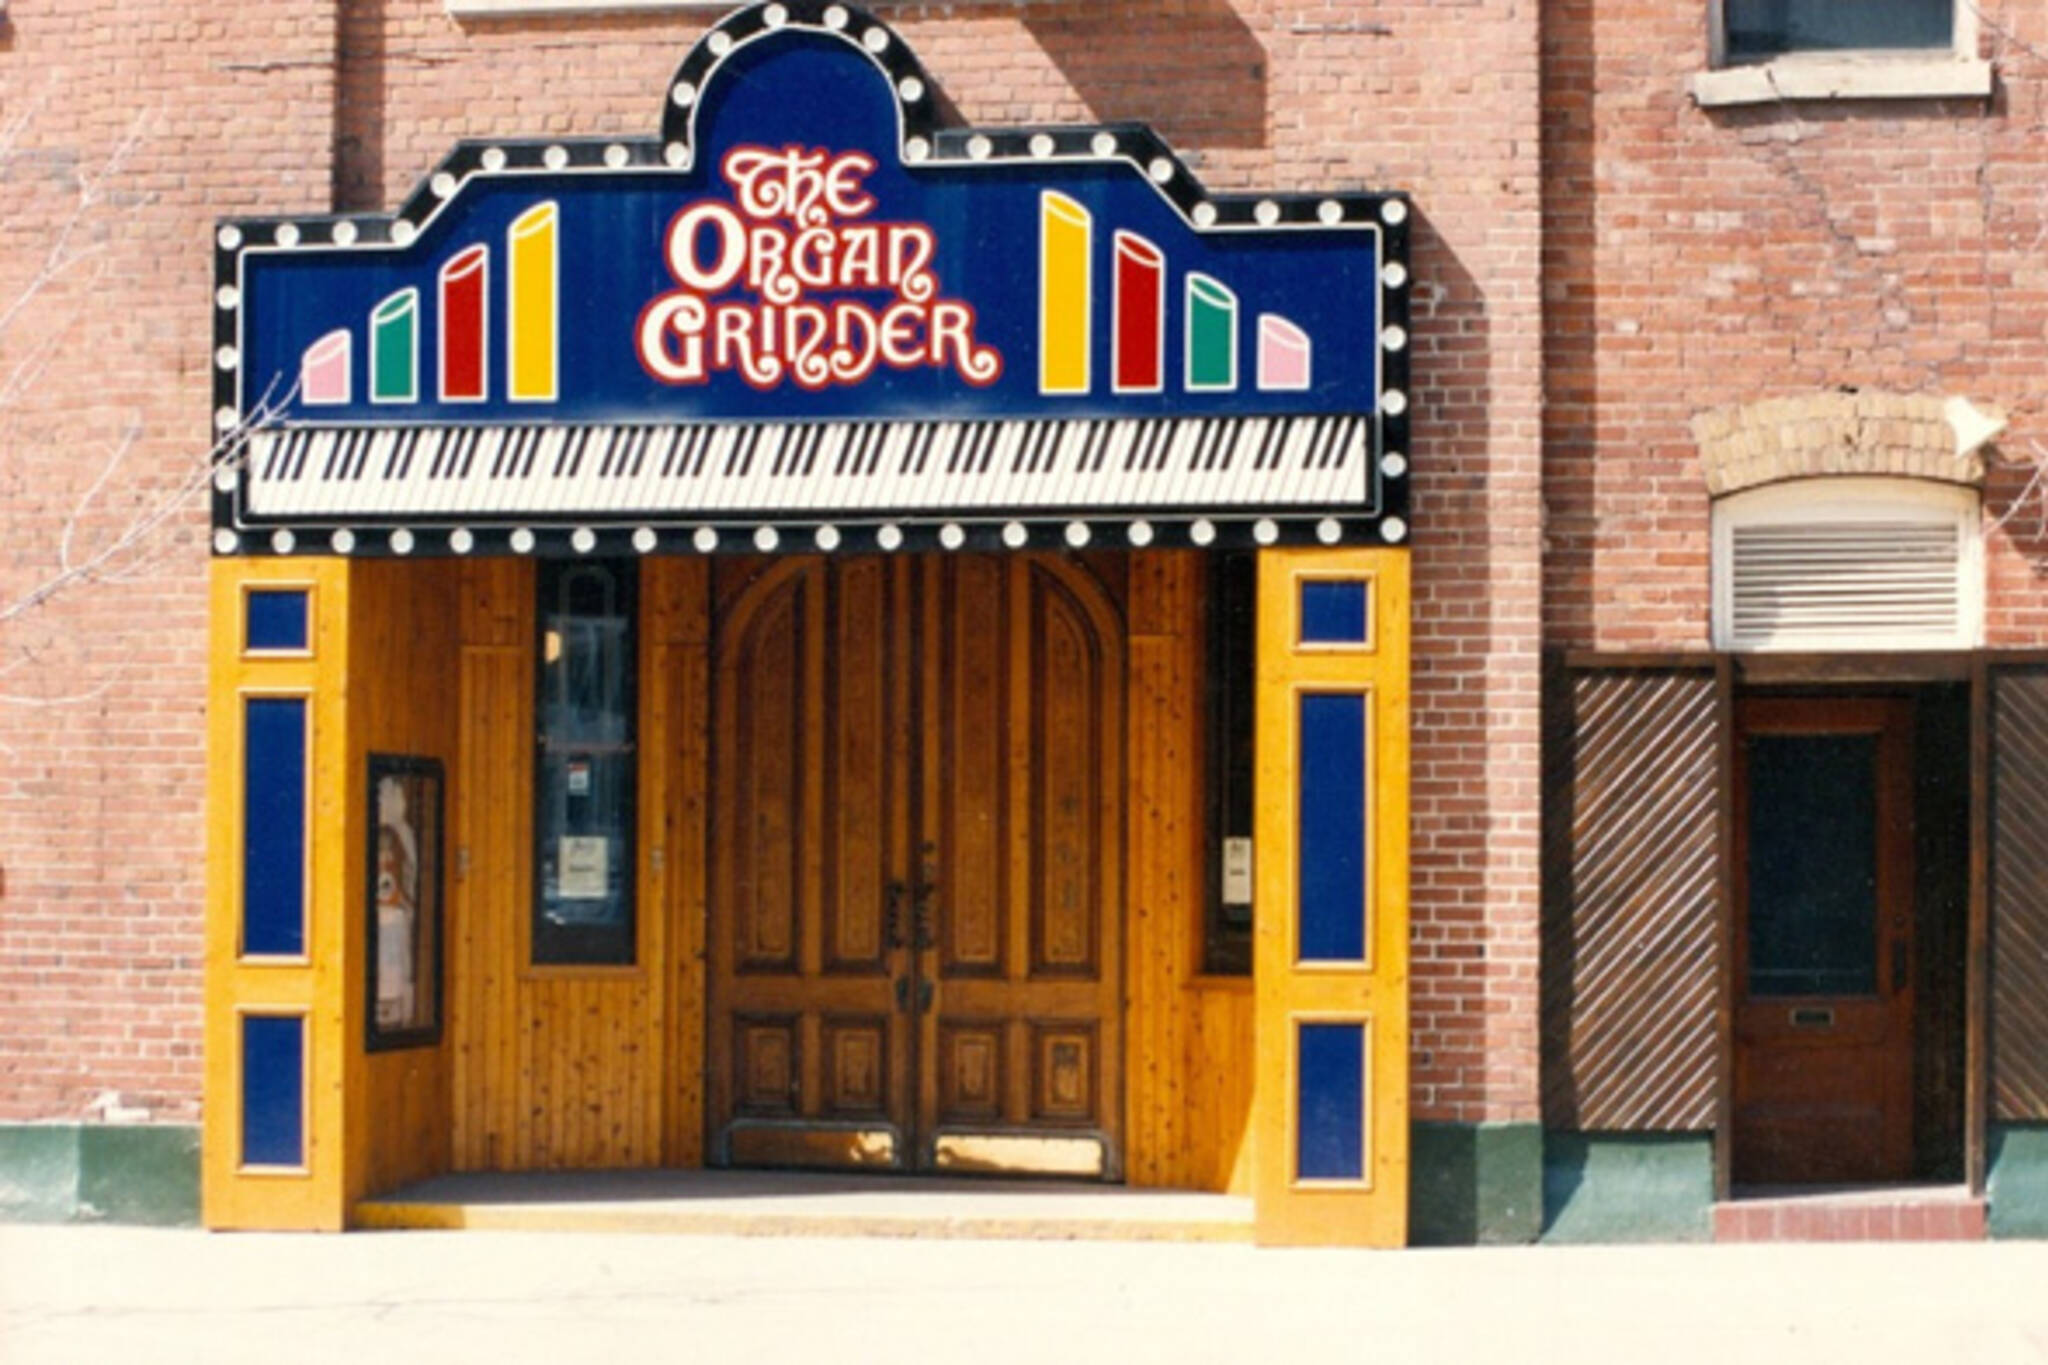 Organ Grinder Toronto